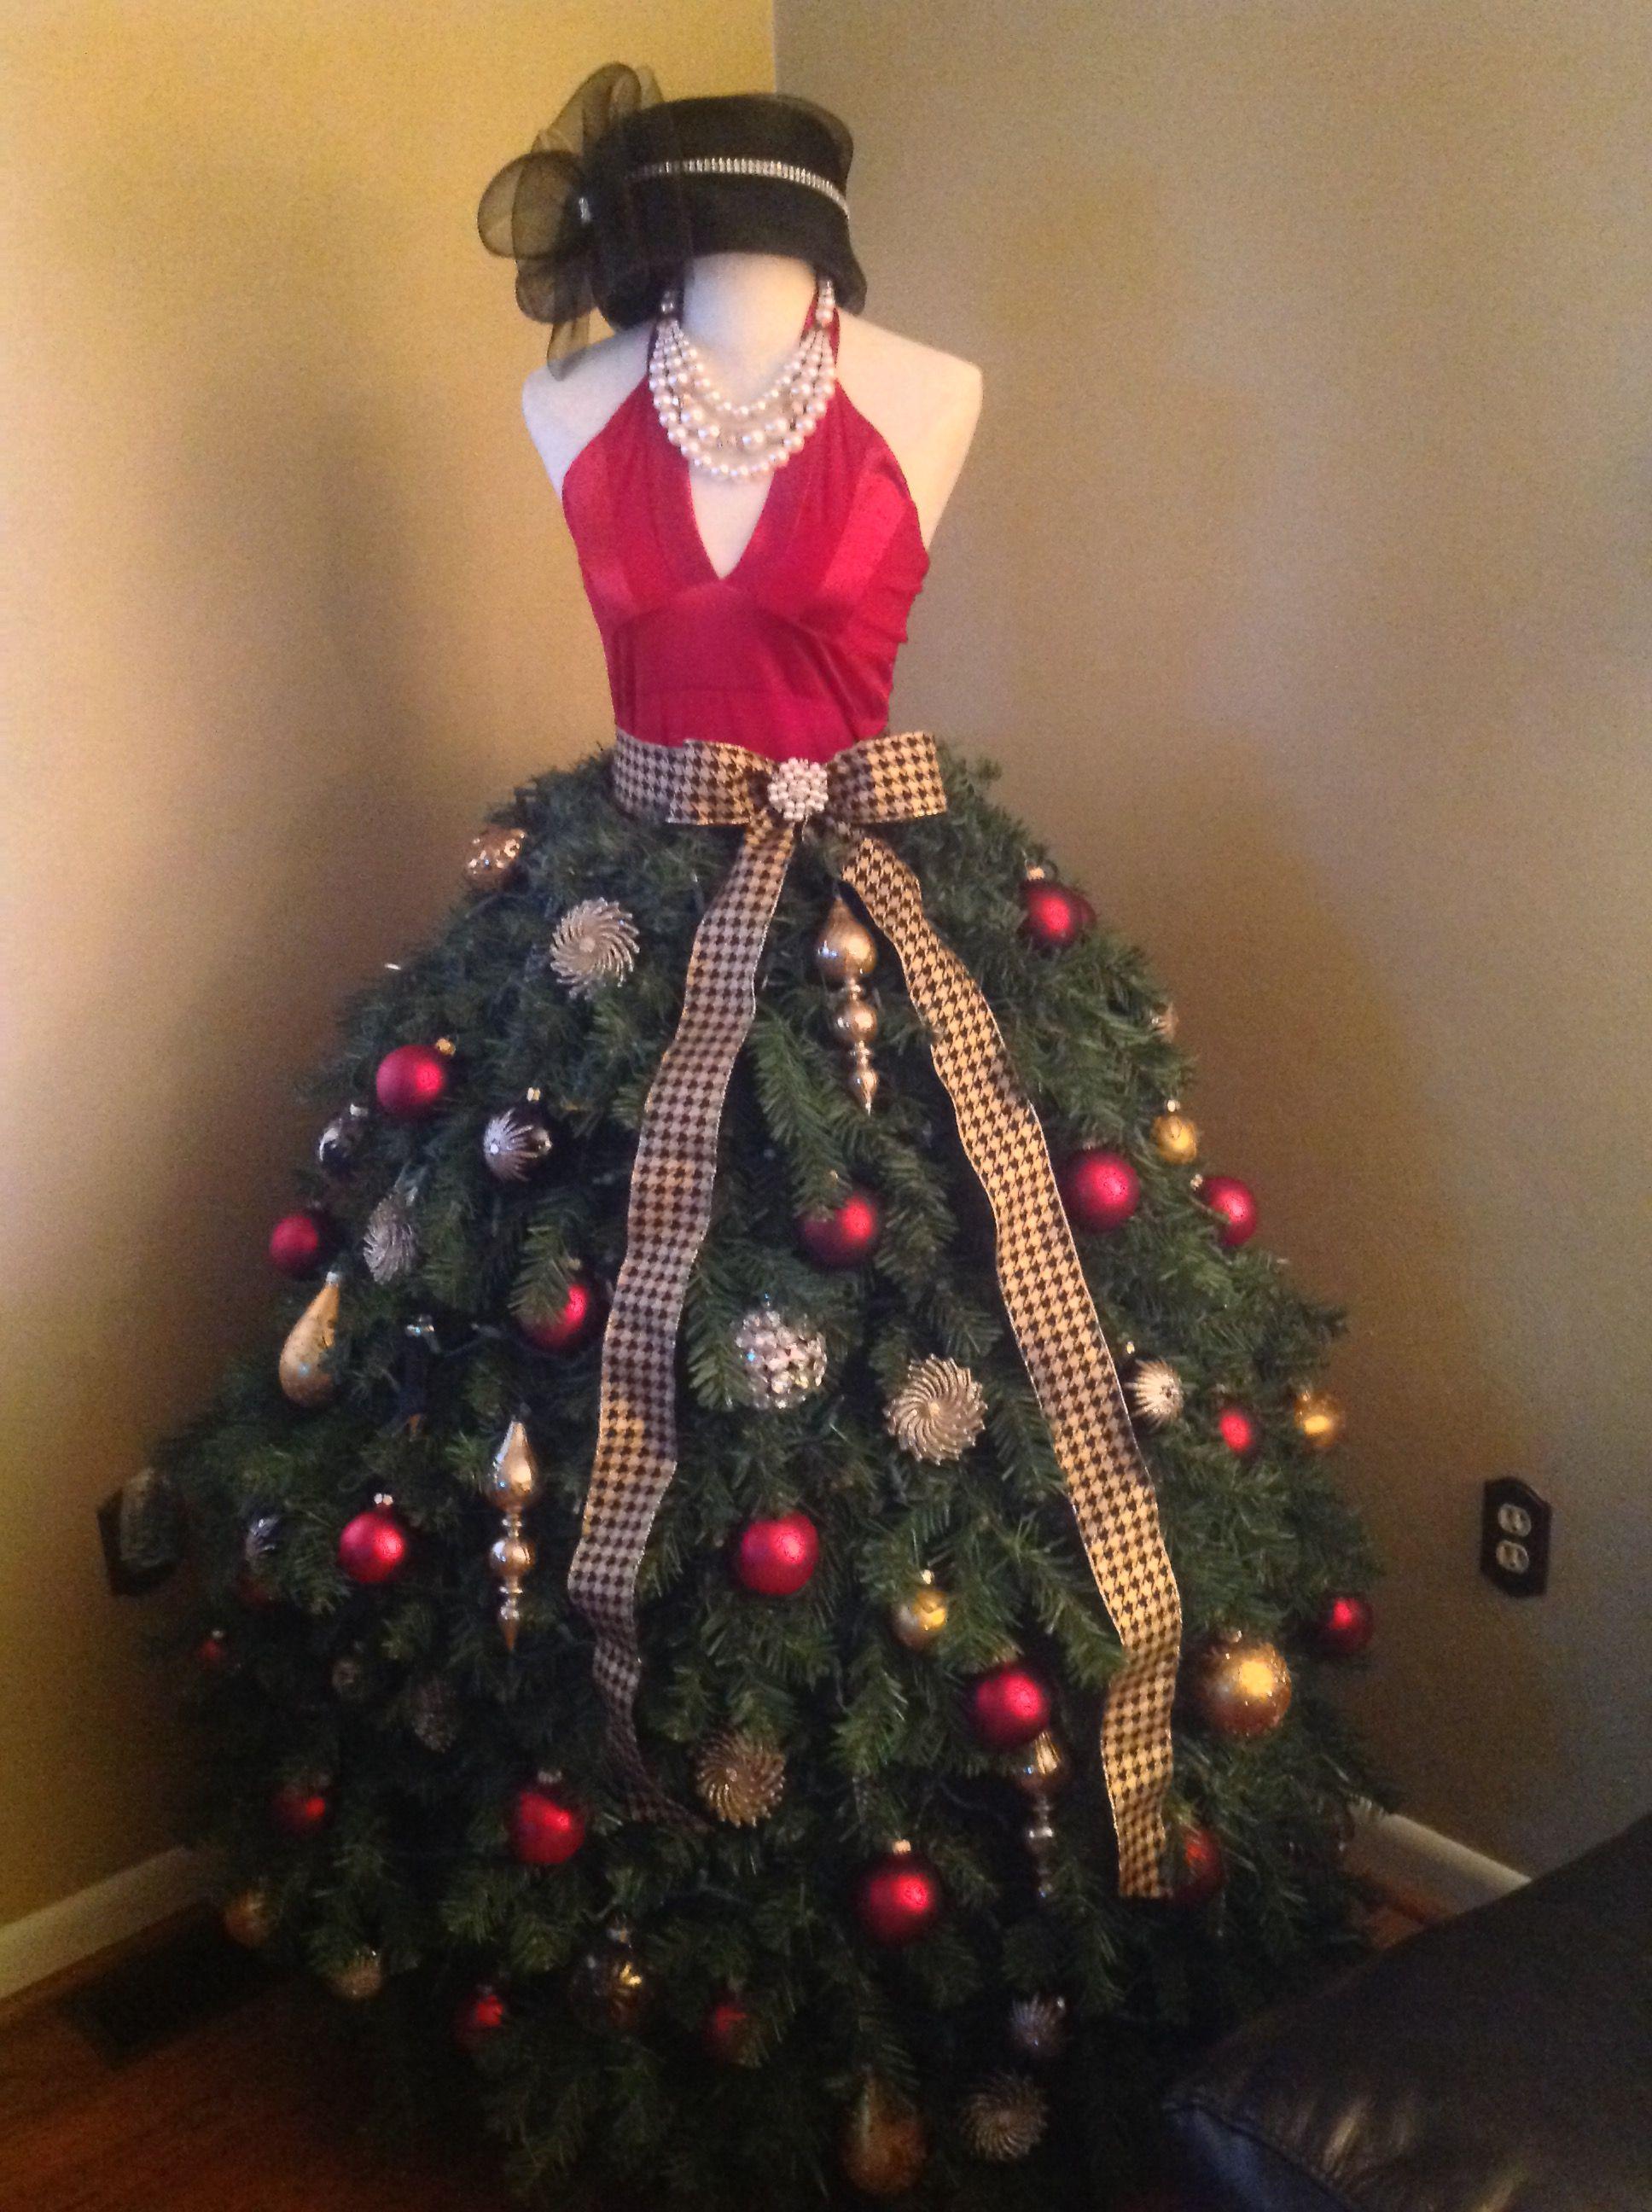 Ebook Tutorial Dress Form Christmas Tree Grand Diva Style Christmas Tree Dress Dress Form Christmas Tree Mannequin Christmas Tree